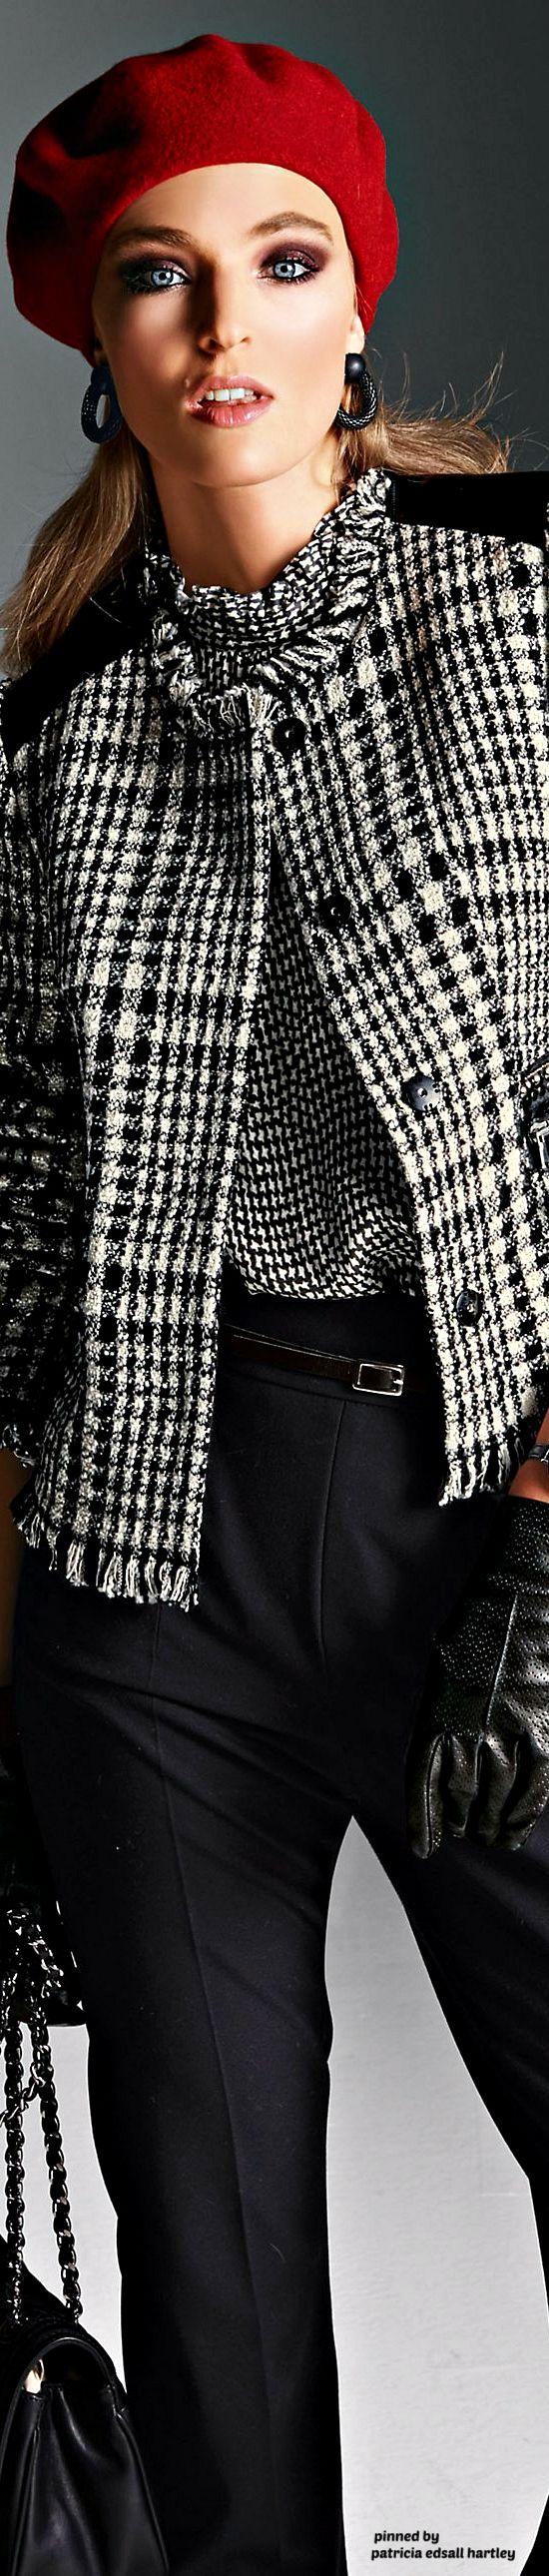 ~ Madeleine Fashion ~ | Patricia Edsall Hartley | madeleine.co.uk